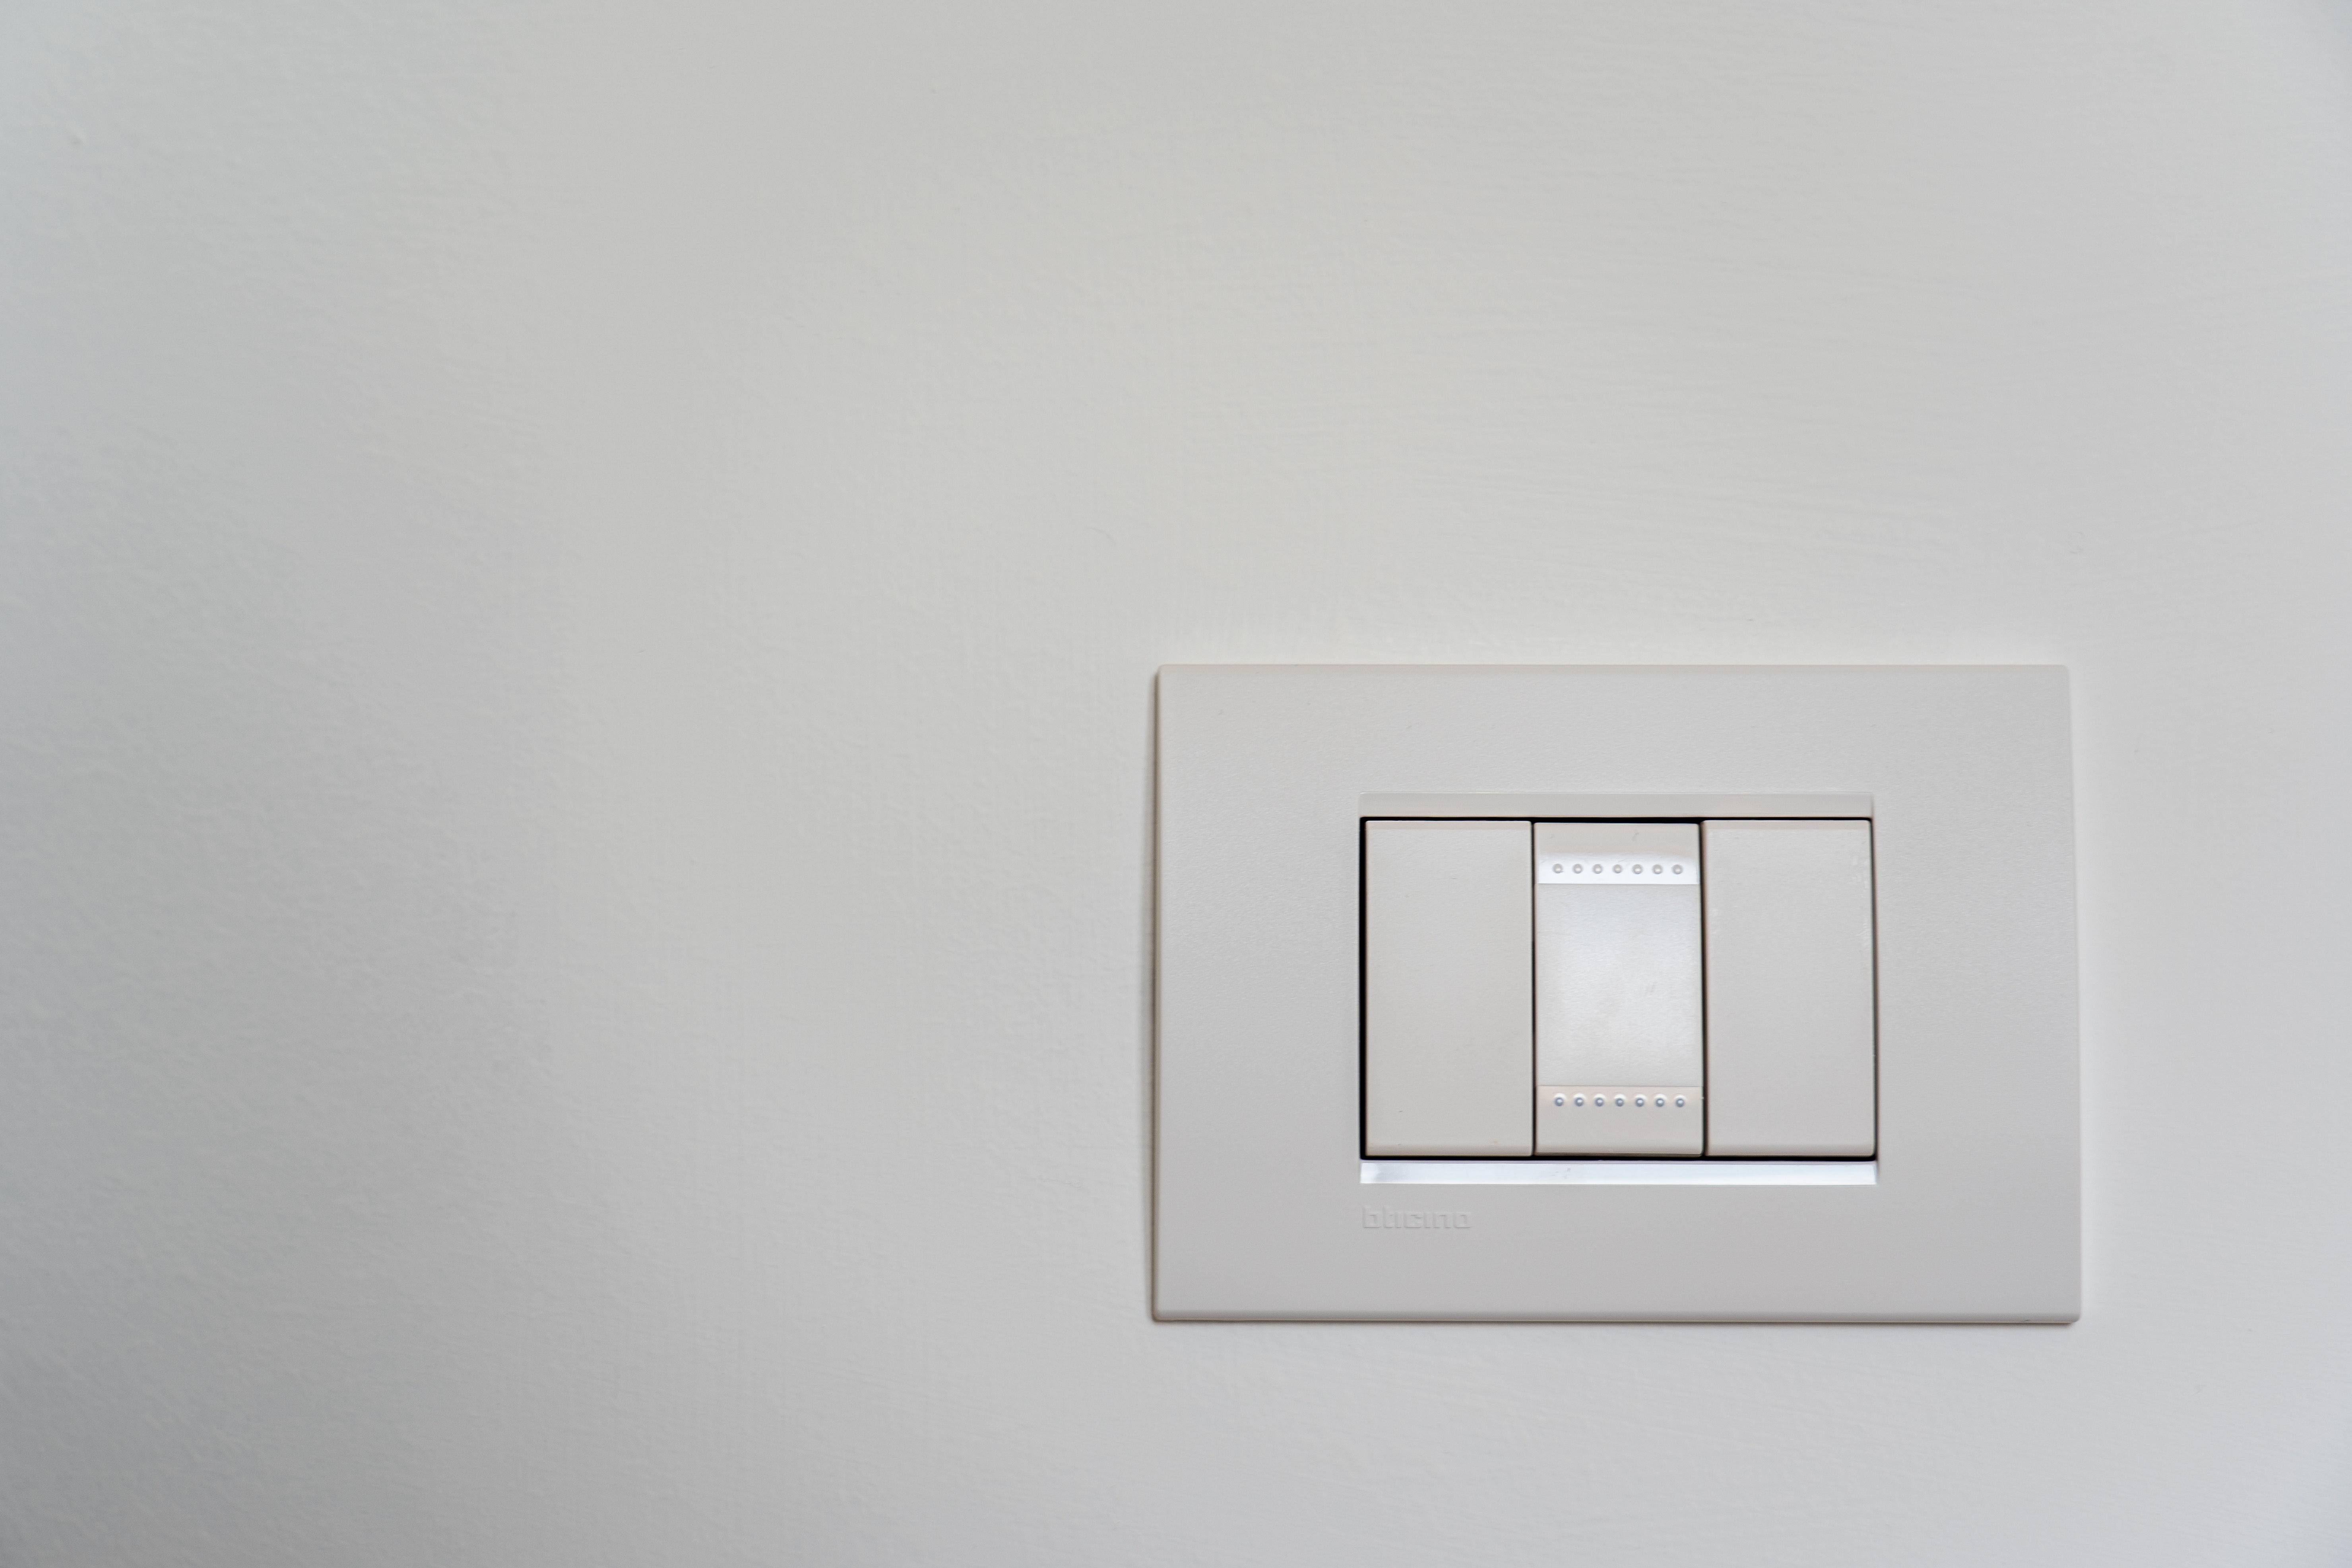 Wireless light switch image